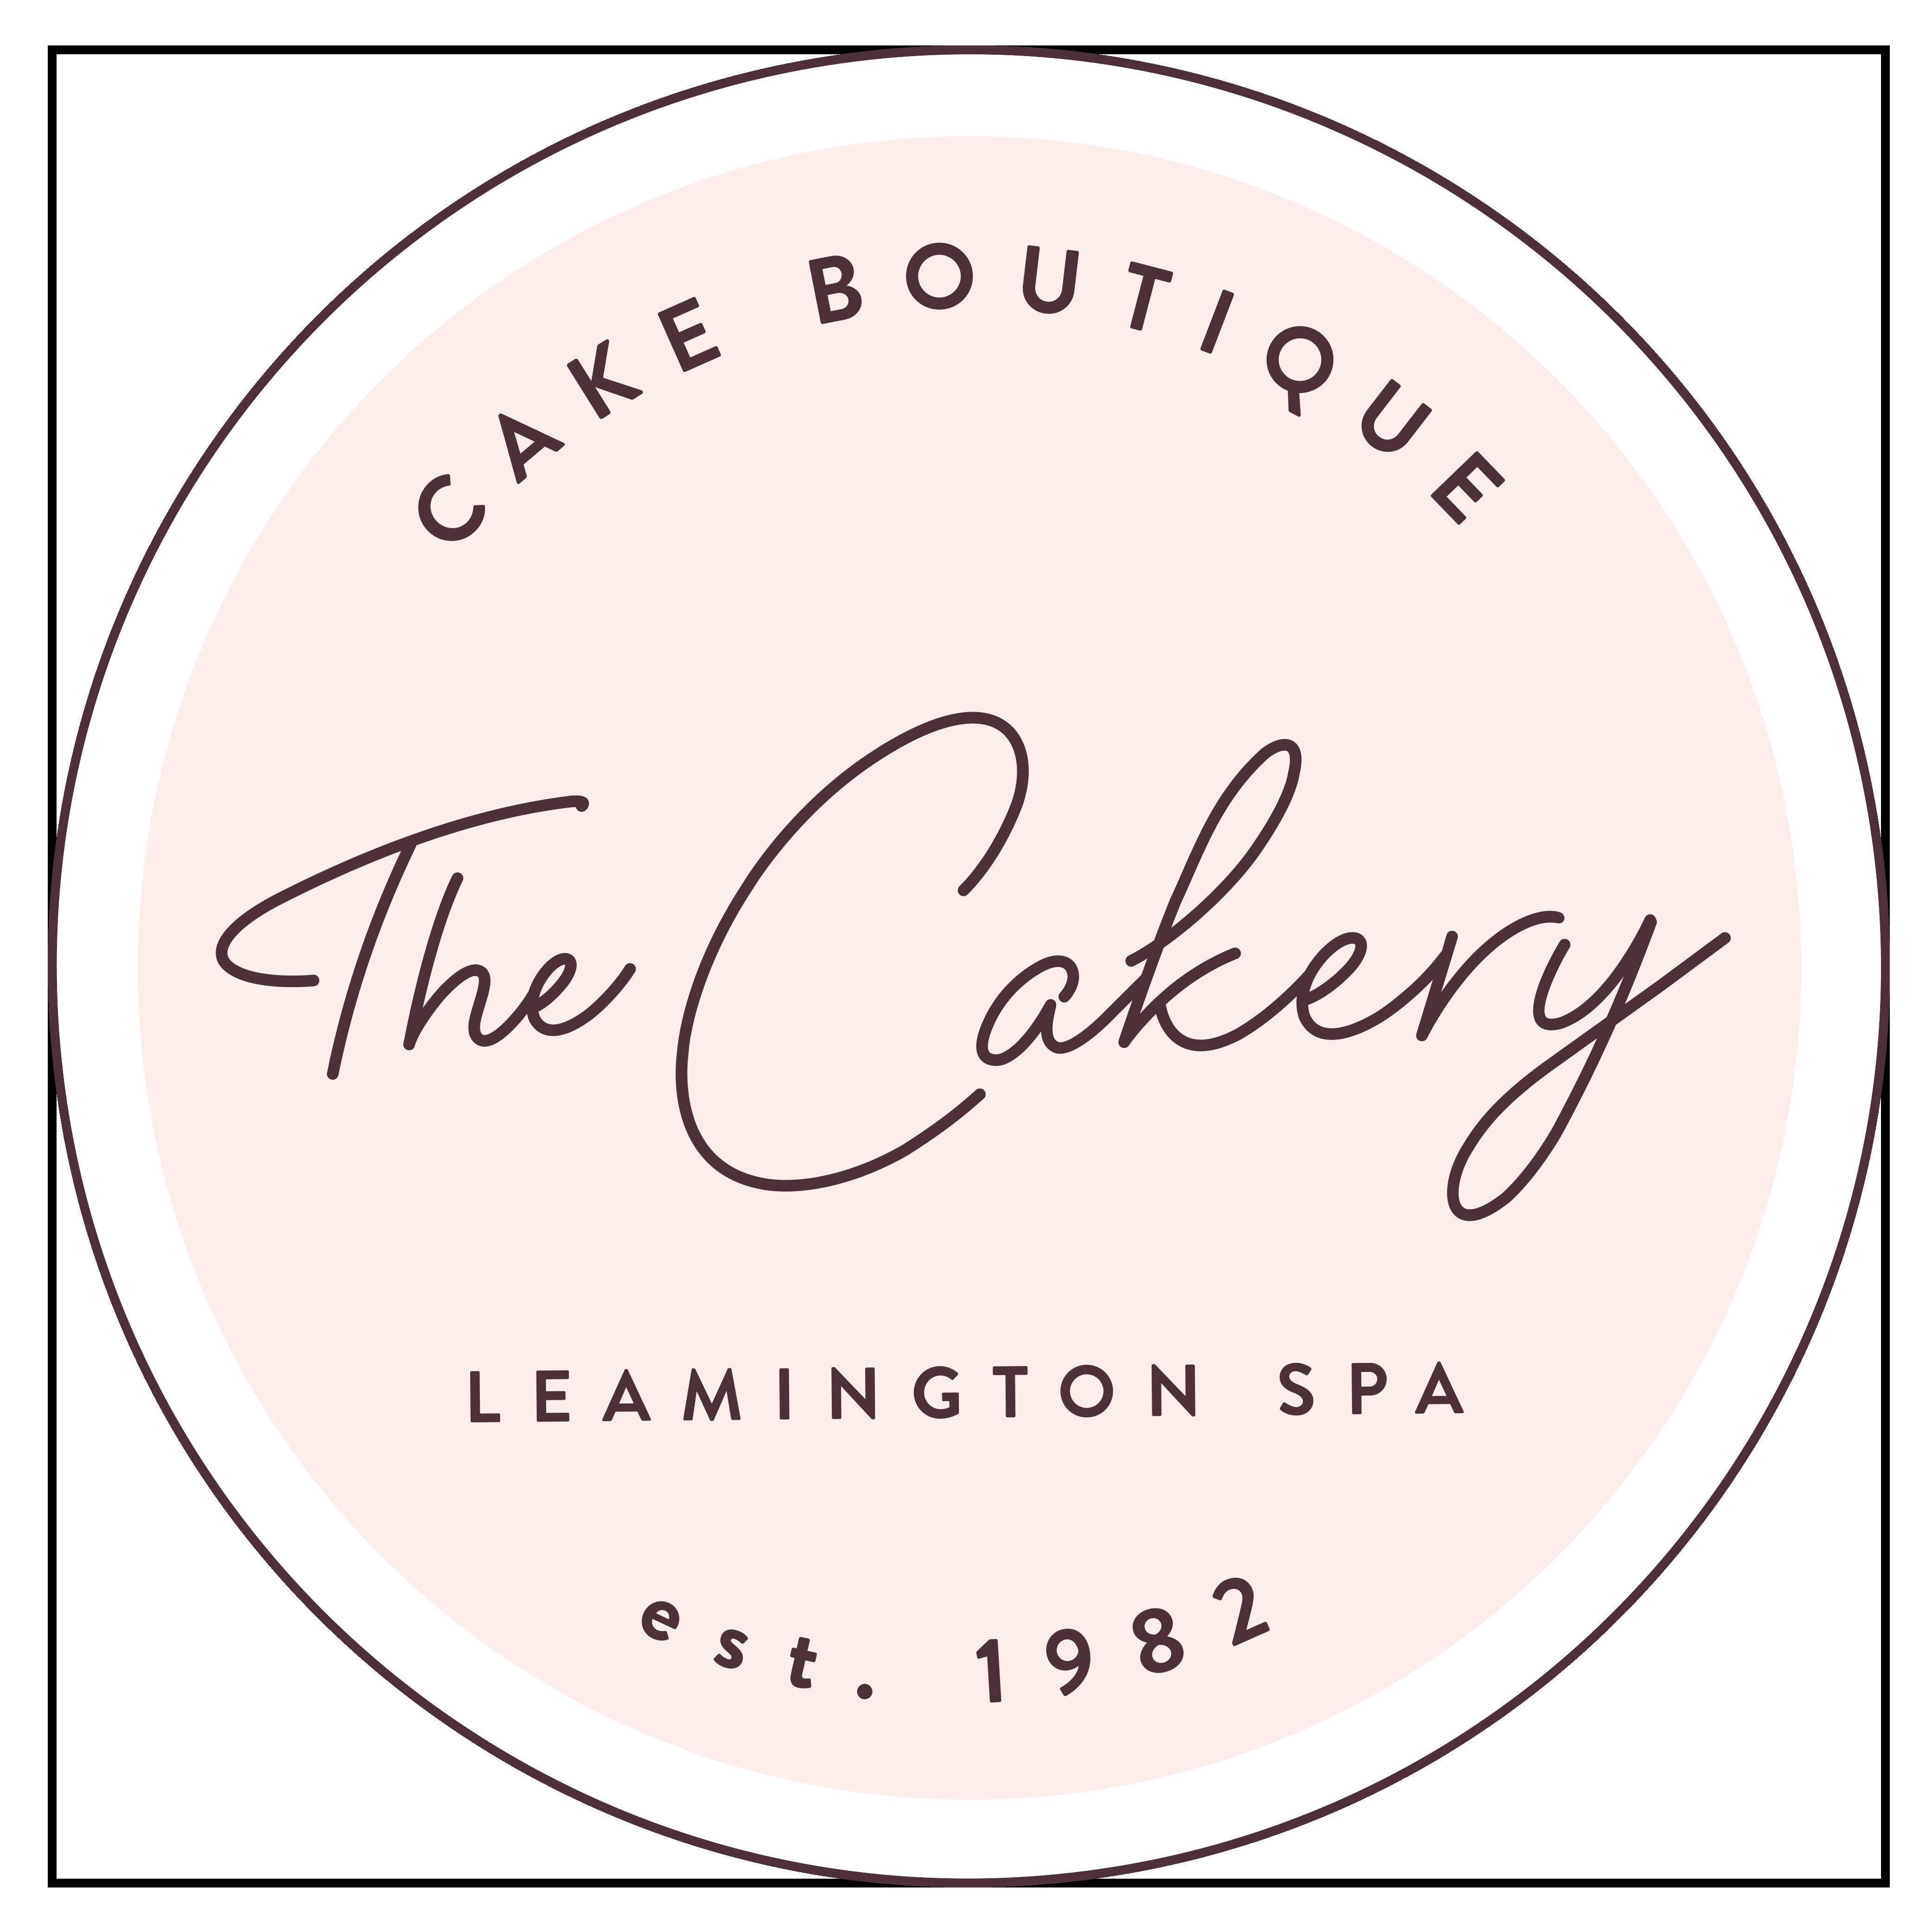 The Cakery Leamington Logo